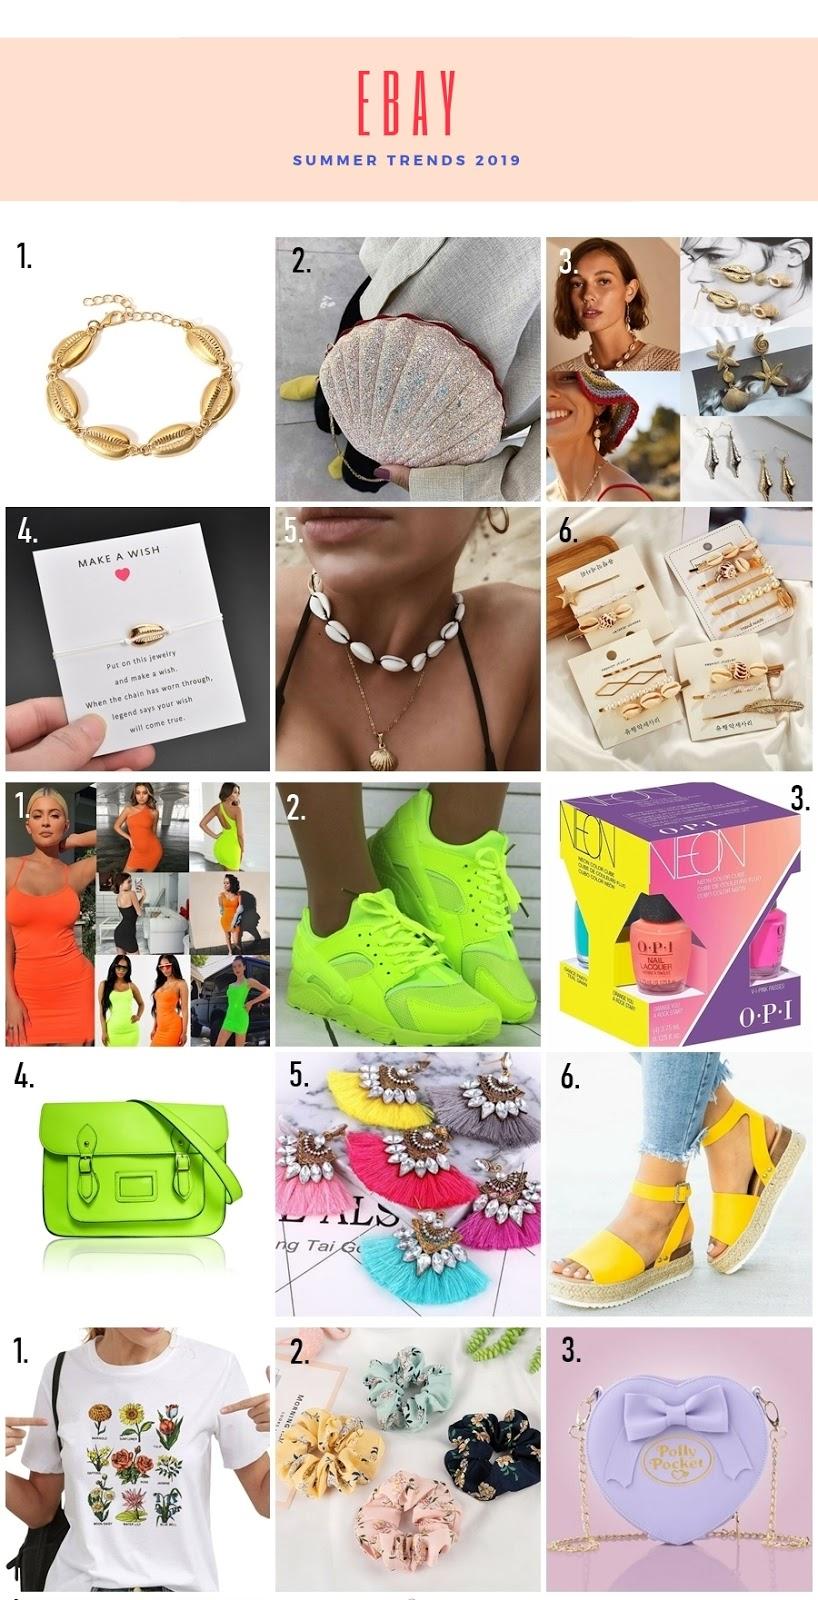 eBay Bargains - Summer Trends Edition